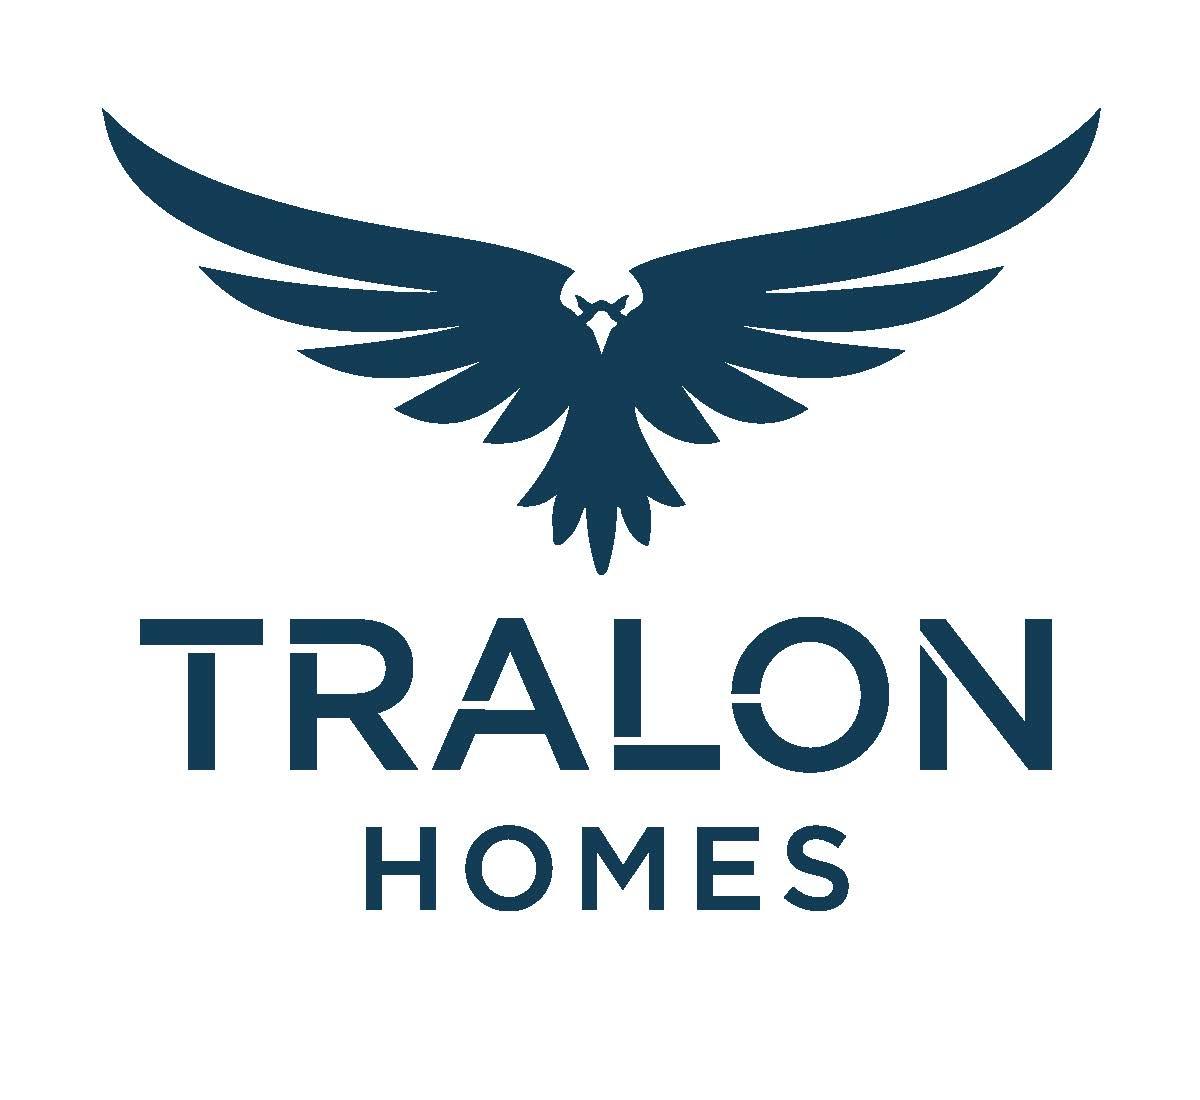 Tralon Homes, LLC